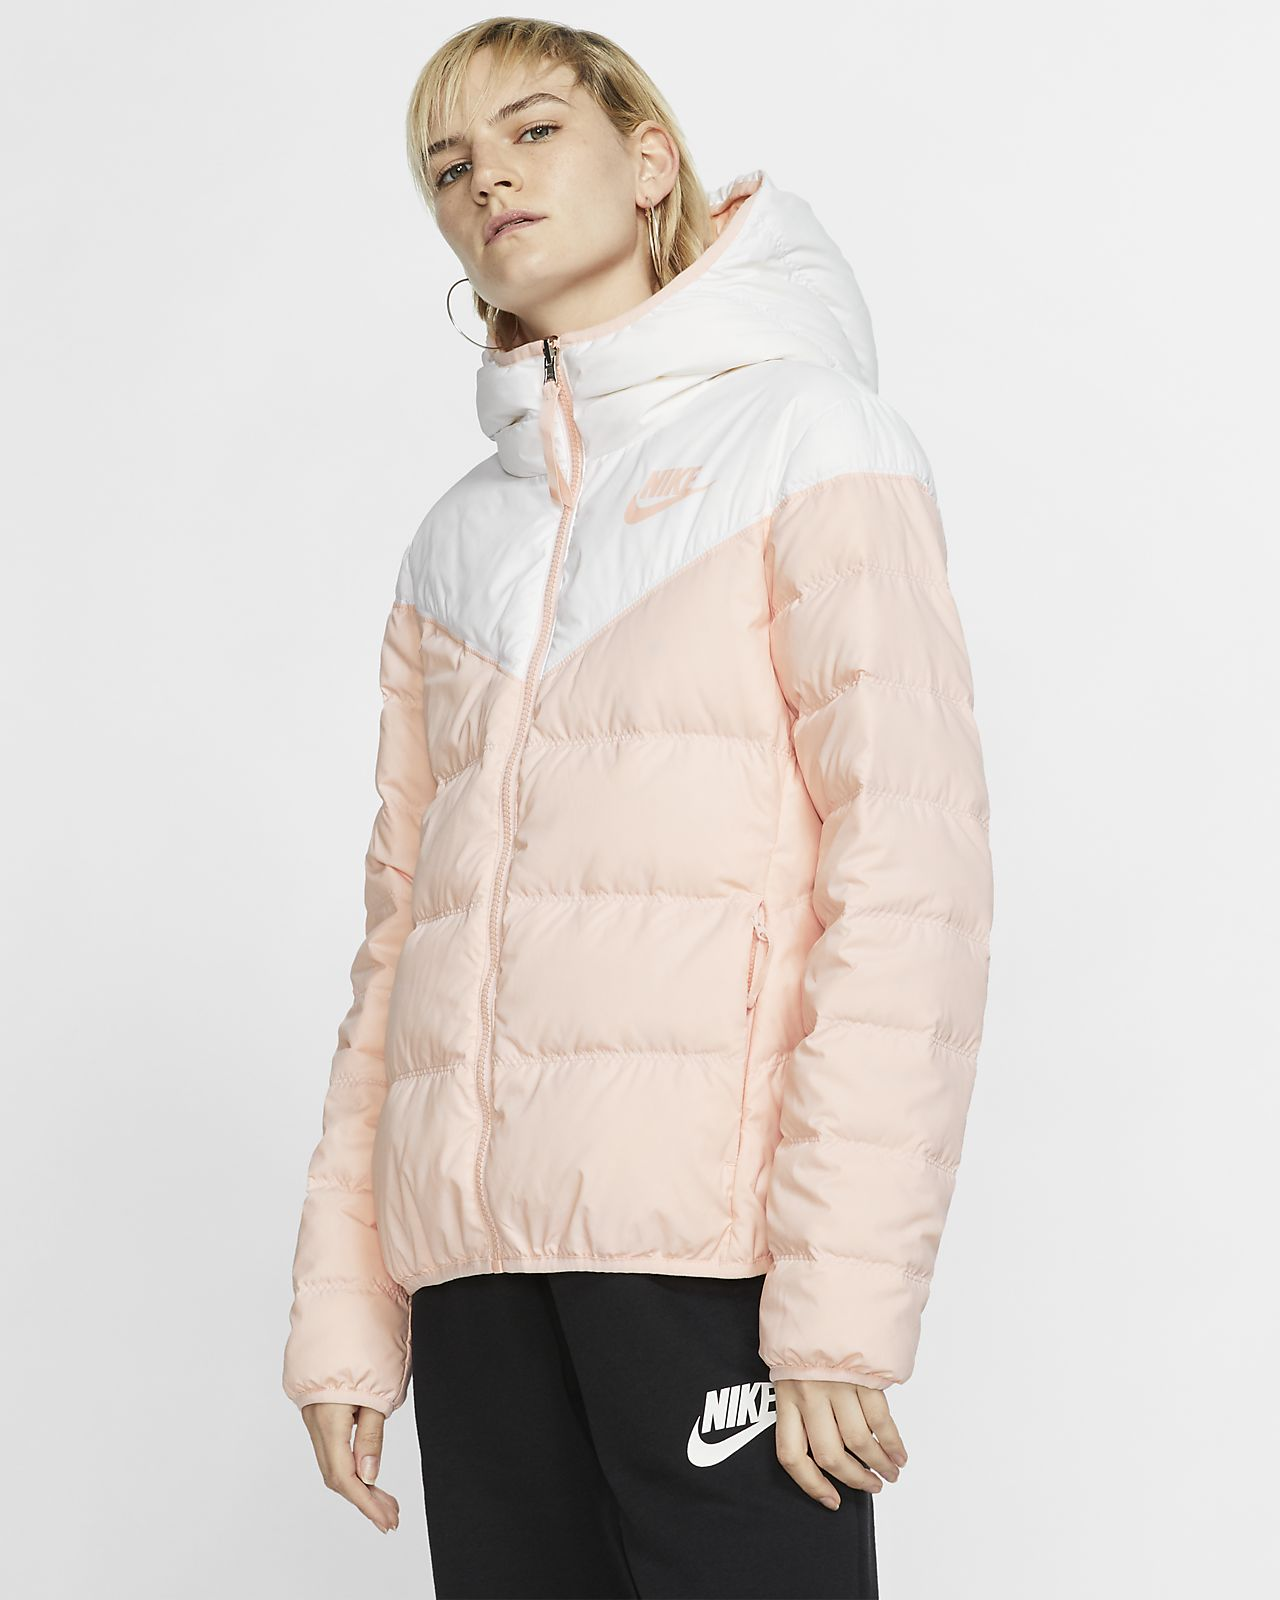 Windrunner Damenjacke Down Sportswear Fill Nike Wendbare mnN8wv0O